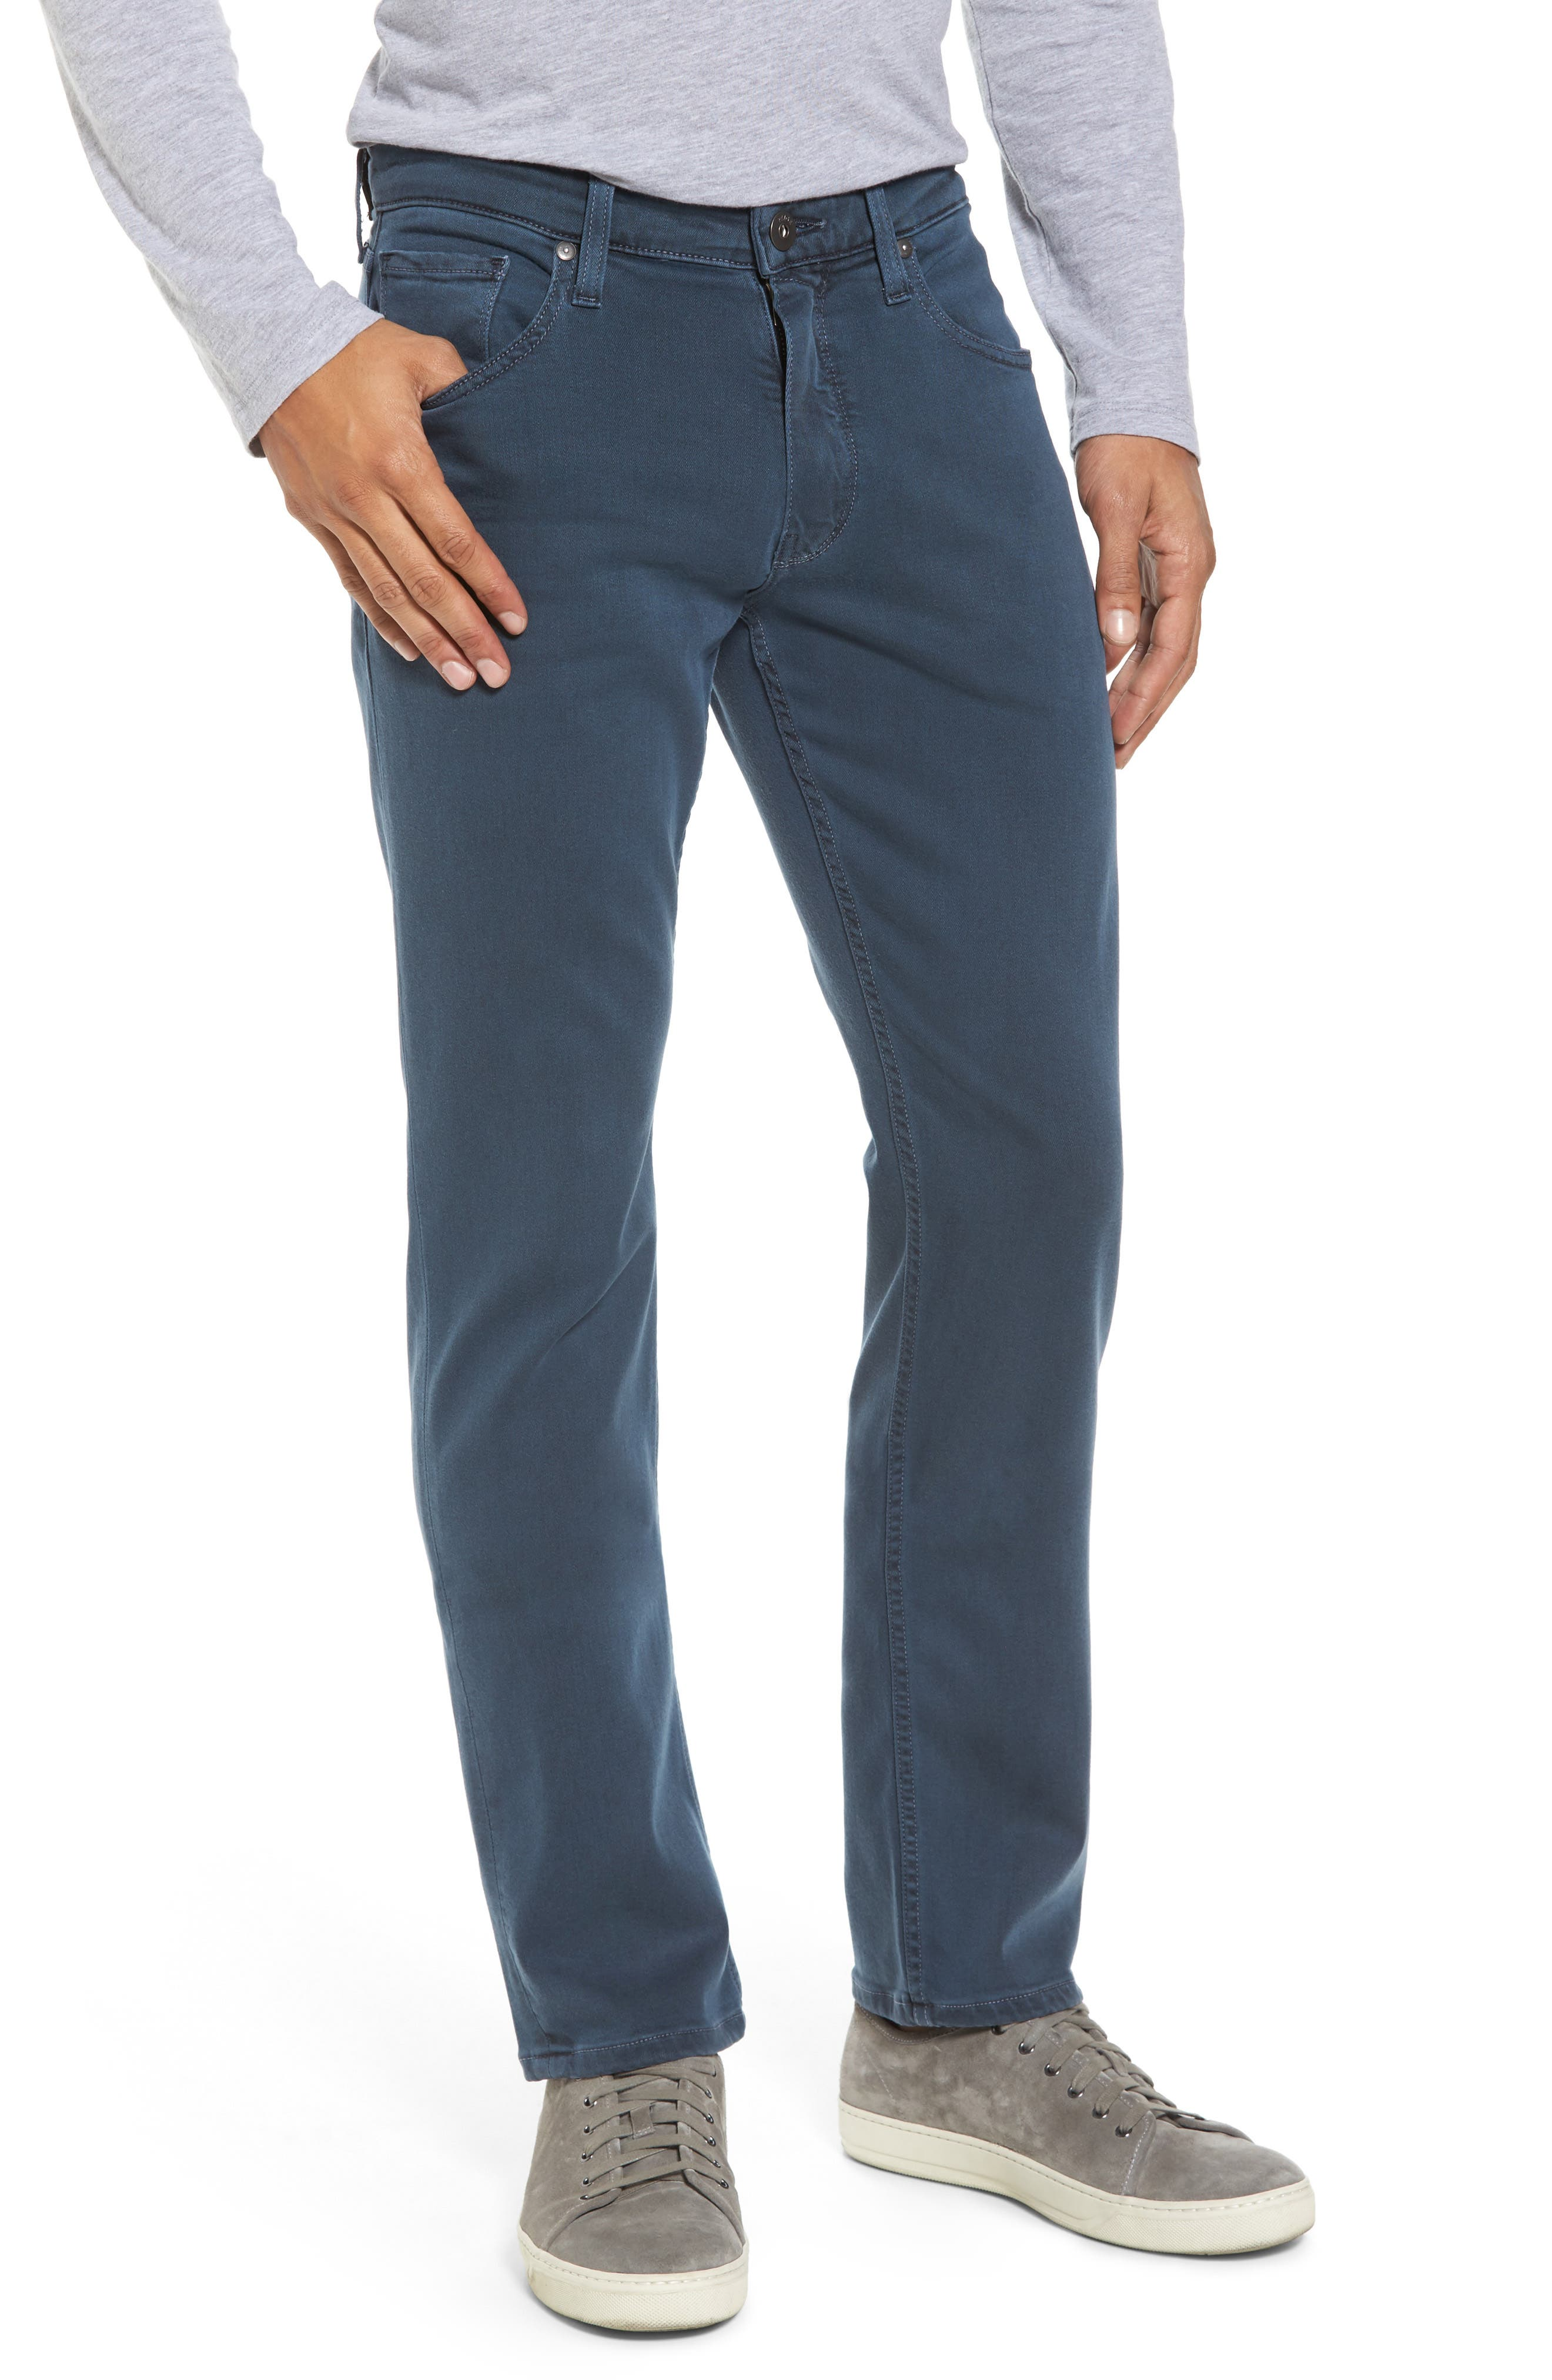 Alternate Image 1 Selected - PAIGE Transcend - Federal Slim Straight Fit Jeans (Vintage Amalfi)